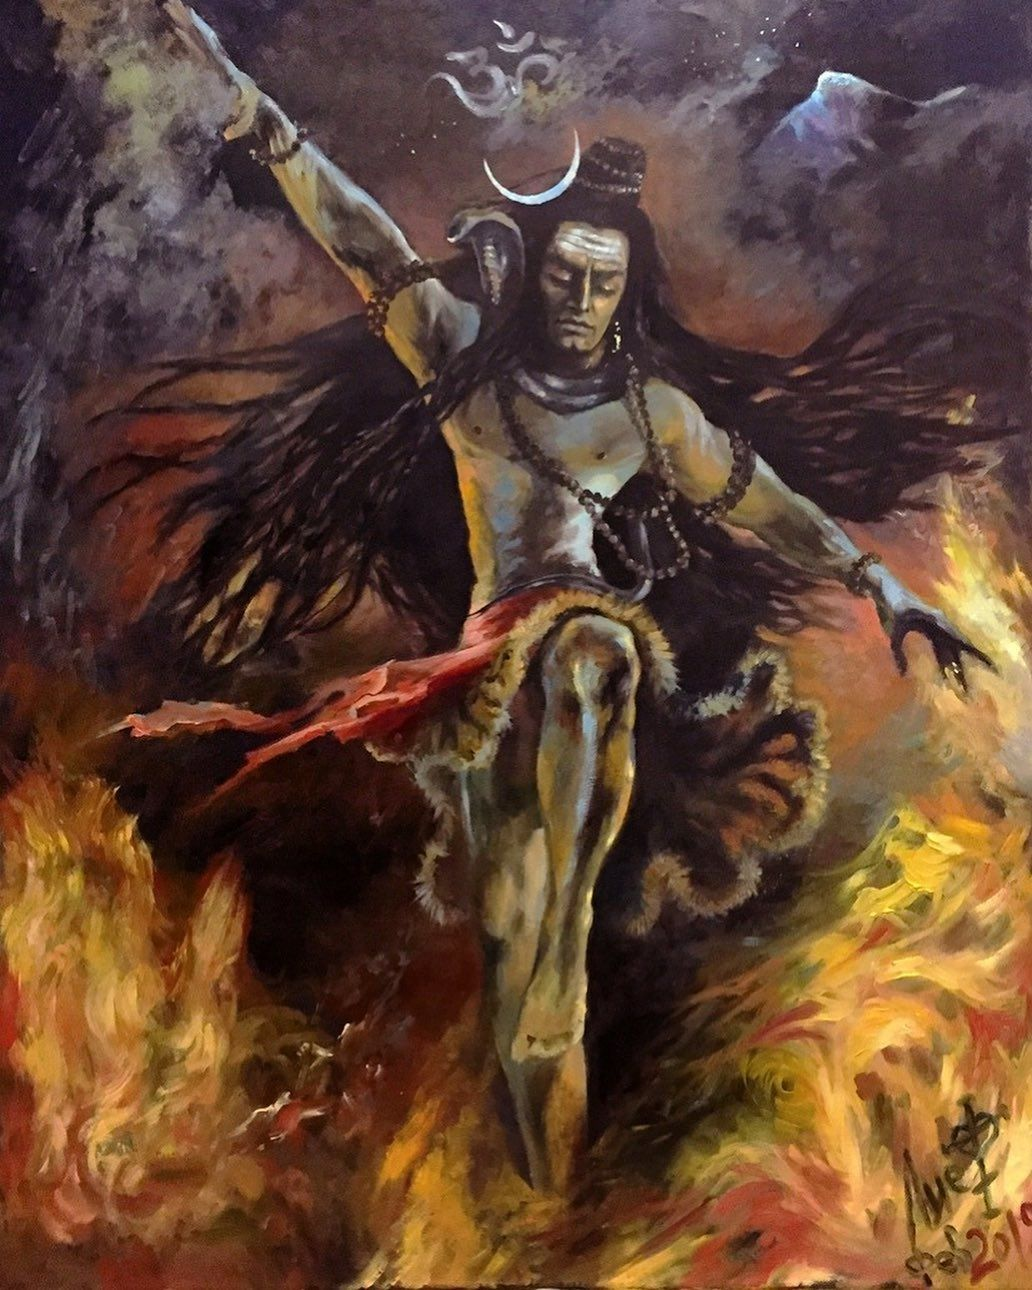 280 Lord Shiva Angry Hd Wallpapers 1080p Download For Desktop 2020 Mahadev Animated Images In 2020 Mahadev Lord Shiva Shiva